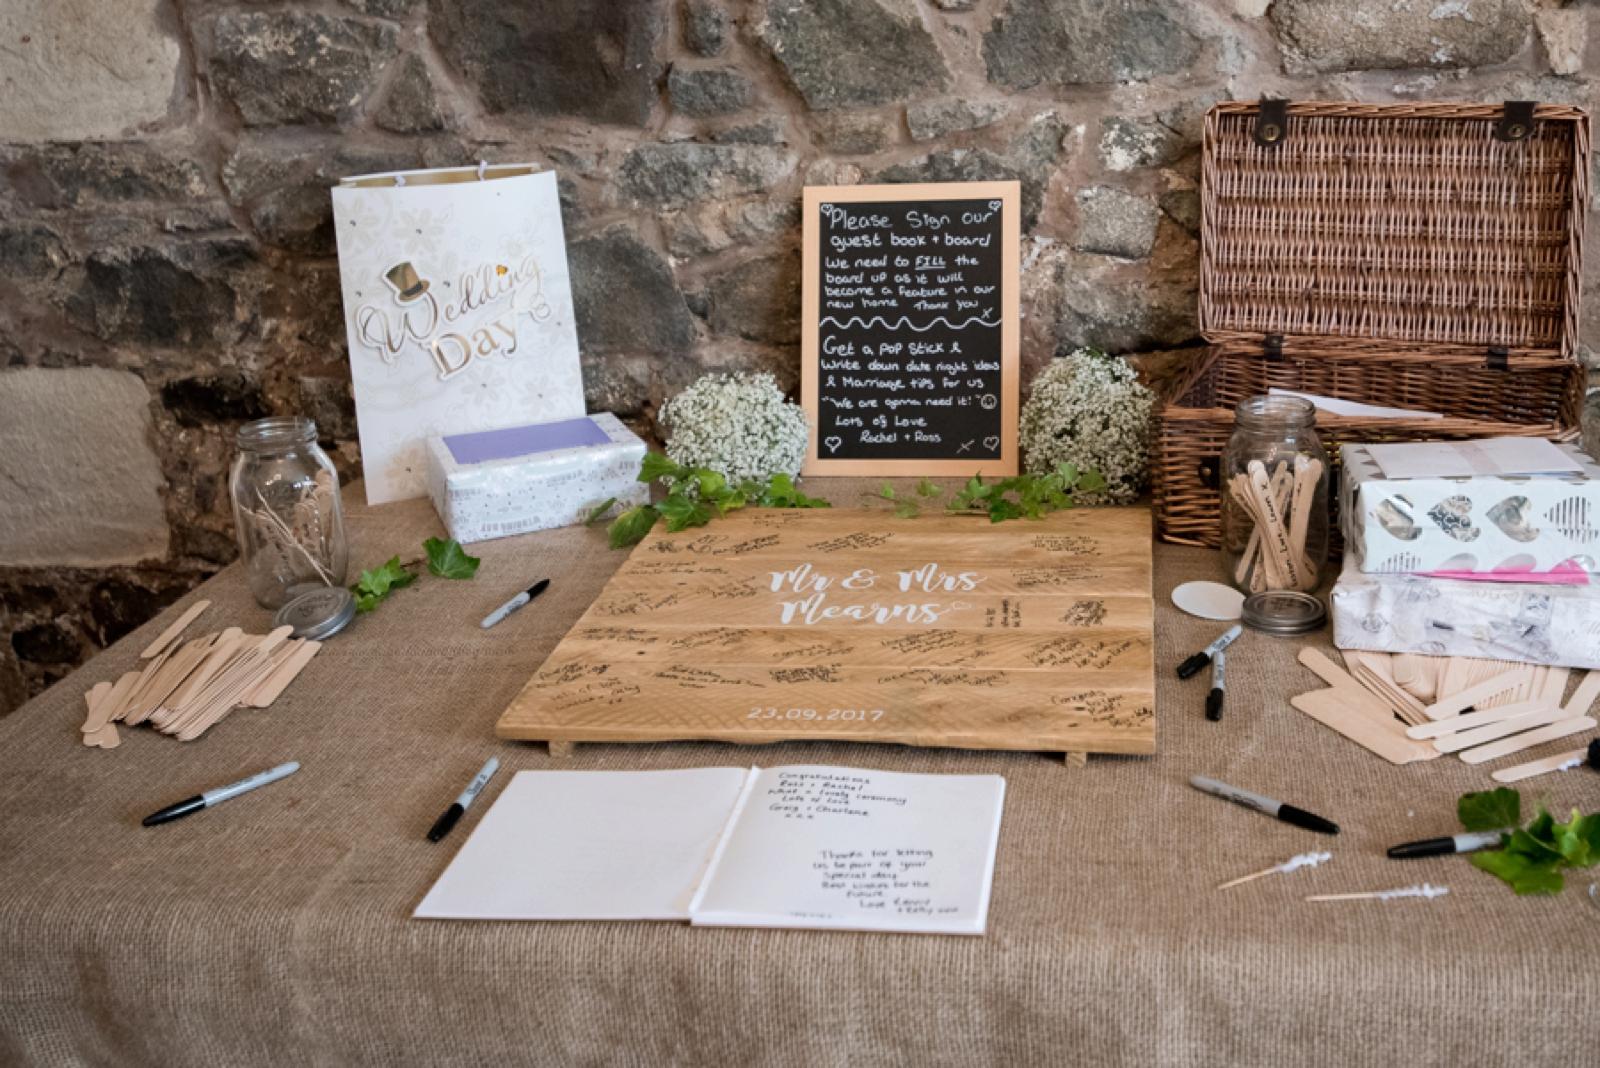 2017-09-23 (Mearns) Pratis Farm Wedding Photography144828.jpg